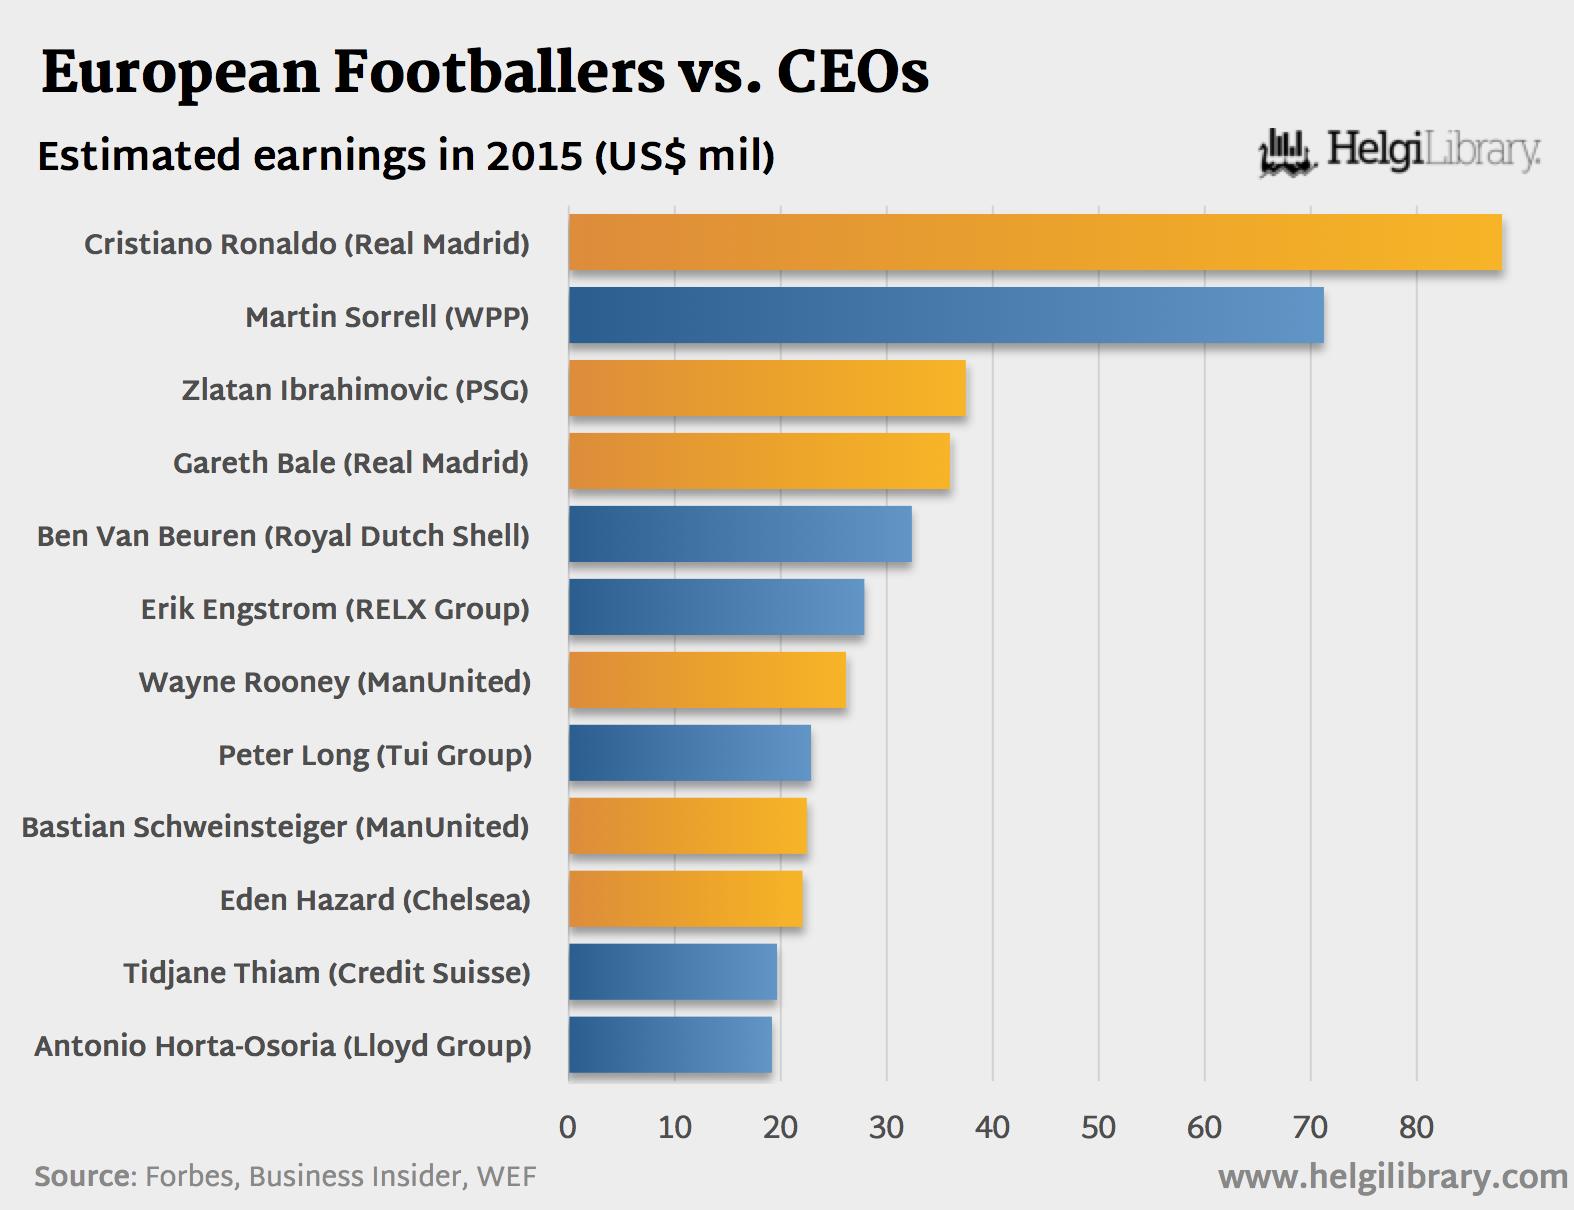 European Footballers vs. CEOs